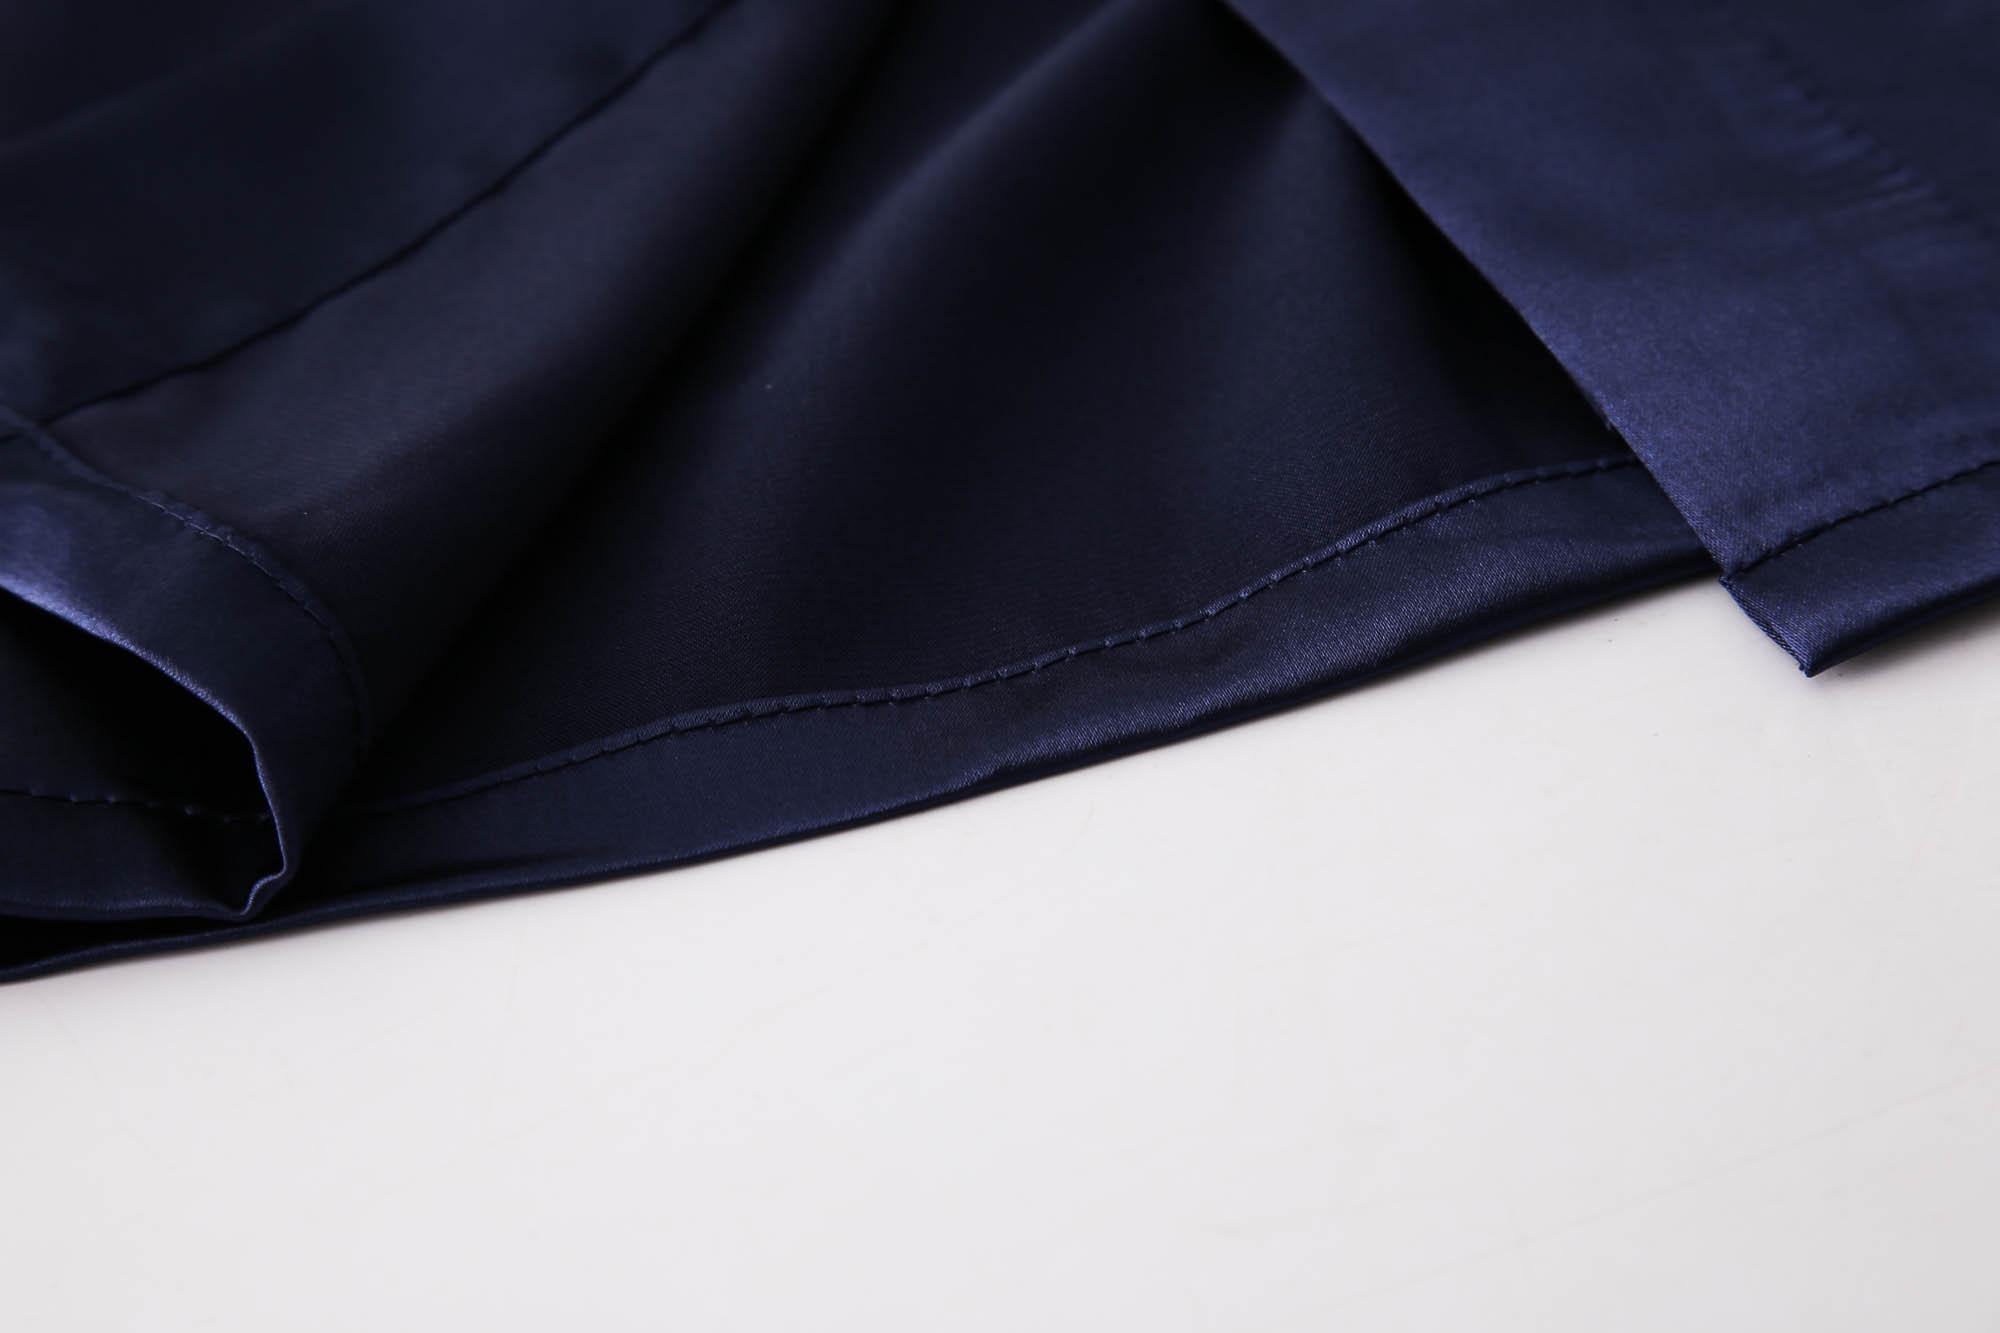 халаты банный свадебный Owiter 13